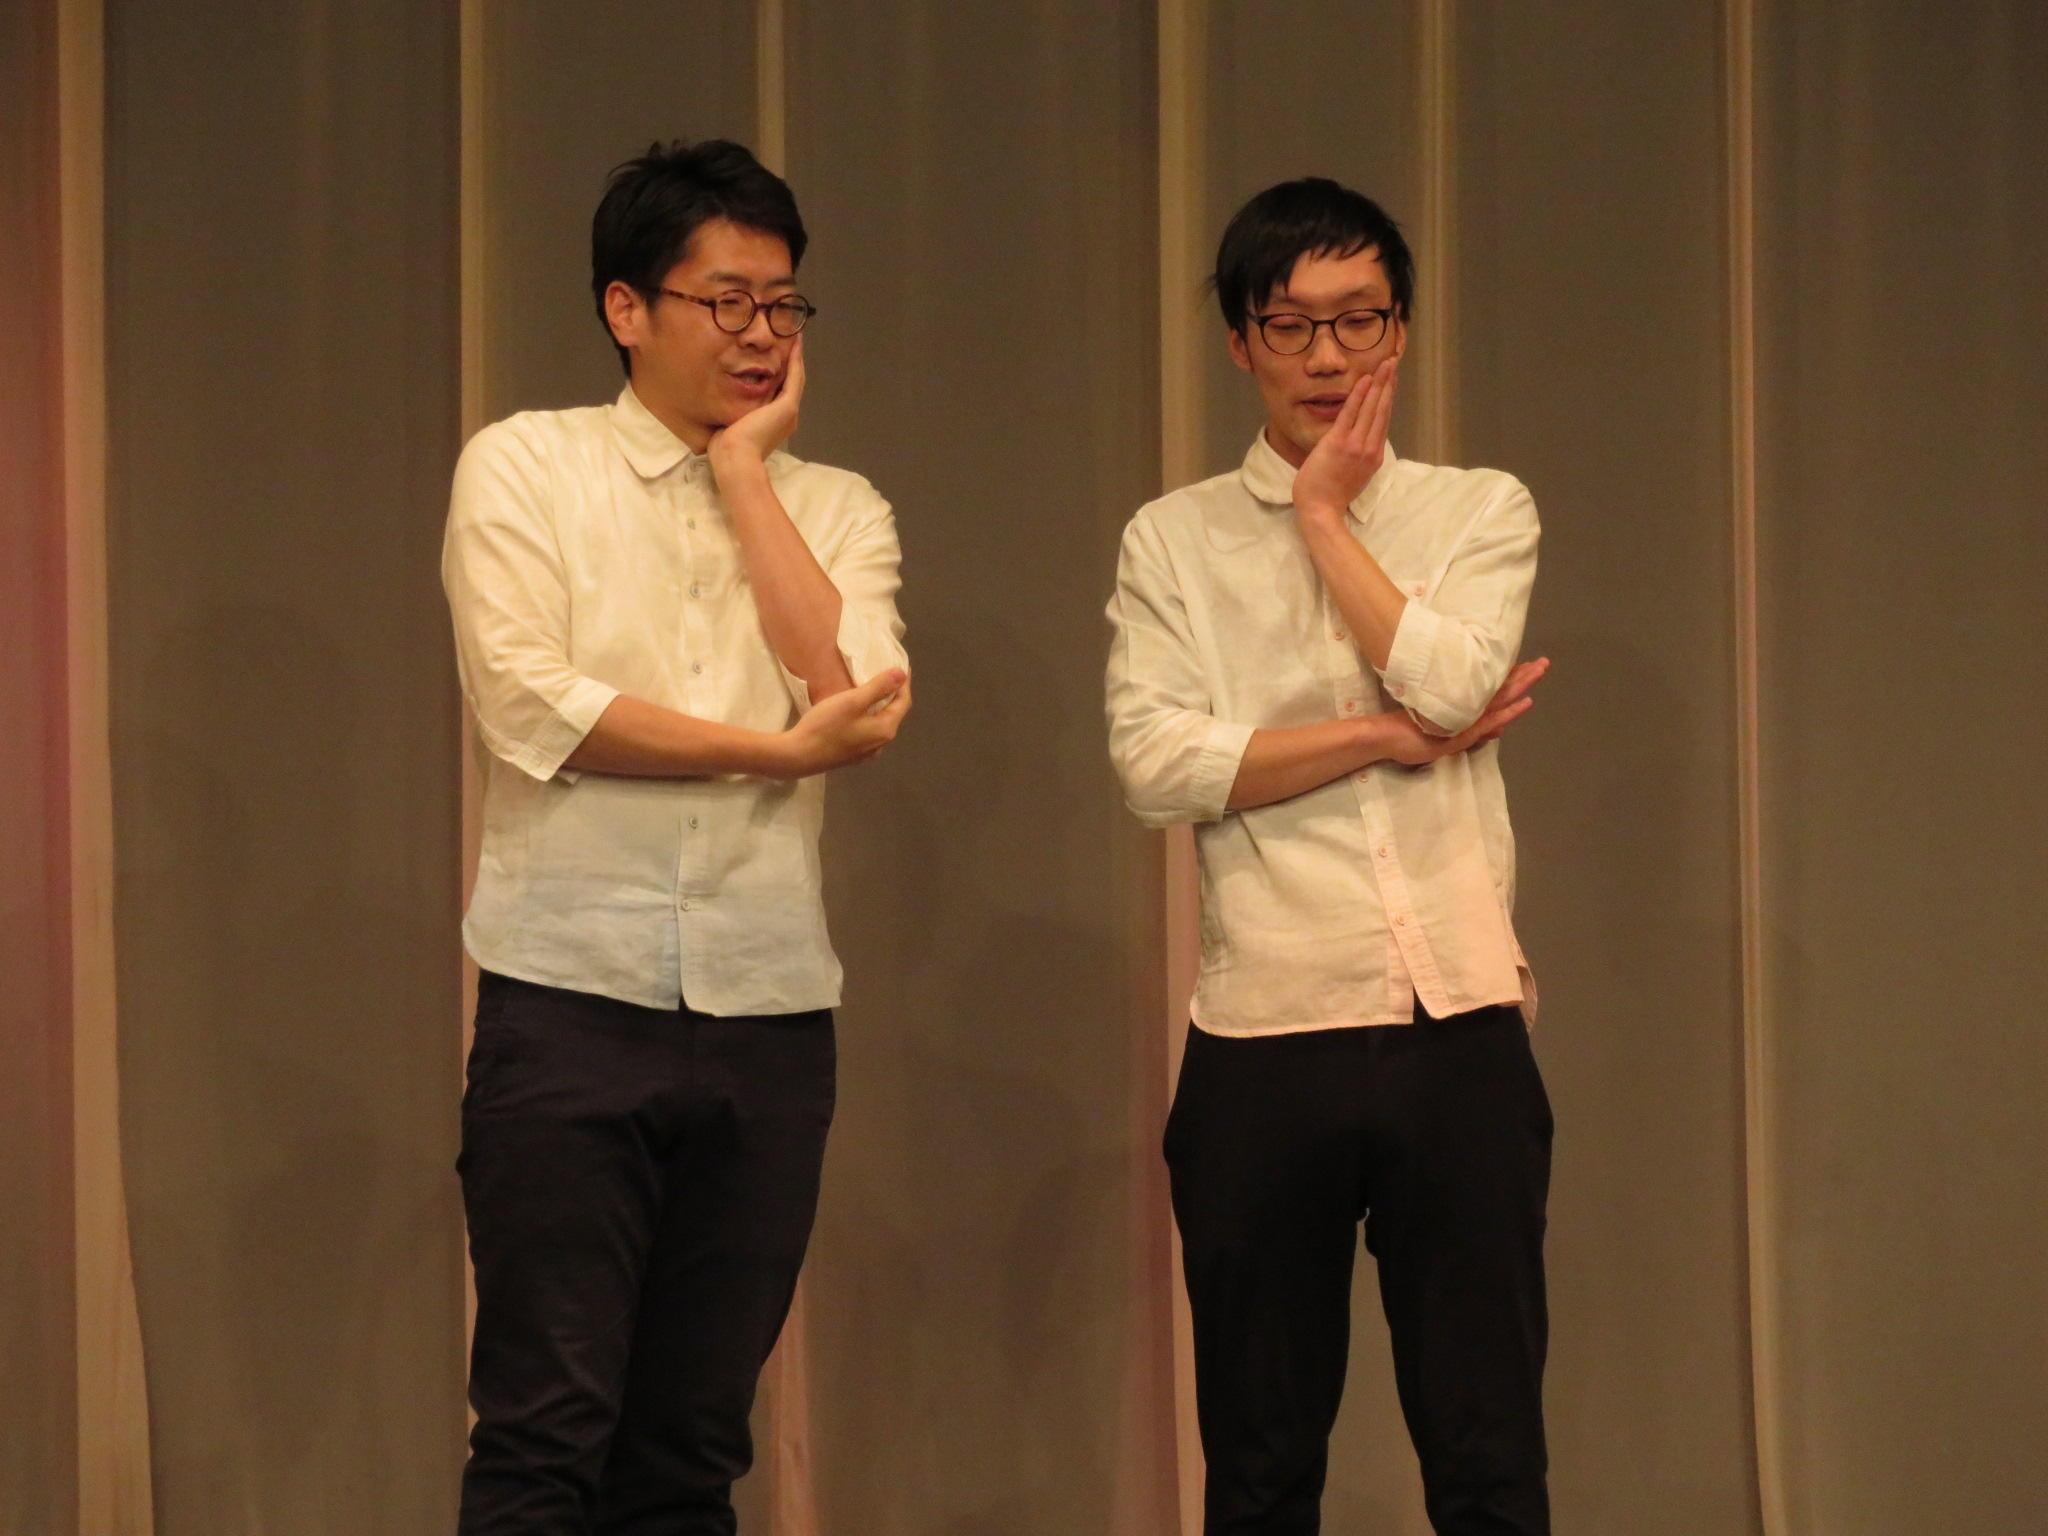 http://news.yoshimoto.co.jp/20180110190501-14bbe7a7eb1abda7124123f5d5f900ecf18ca9bb.jpg